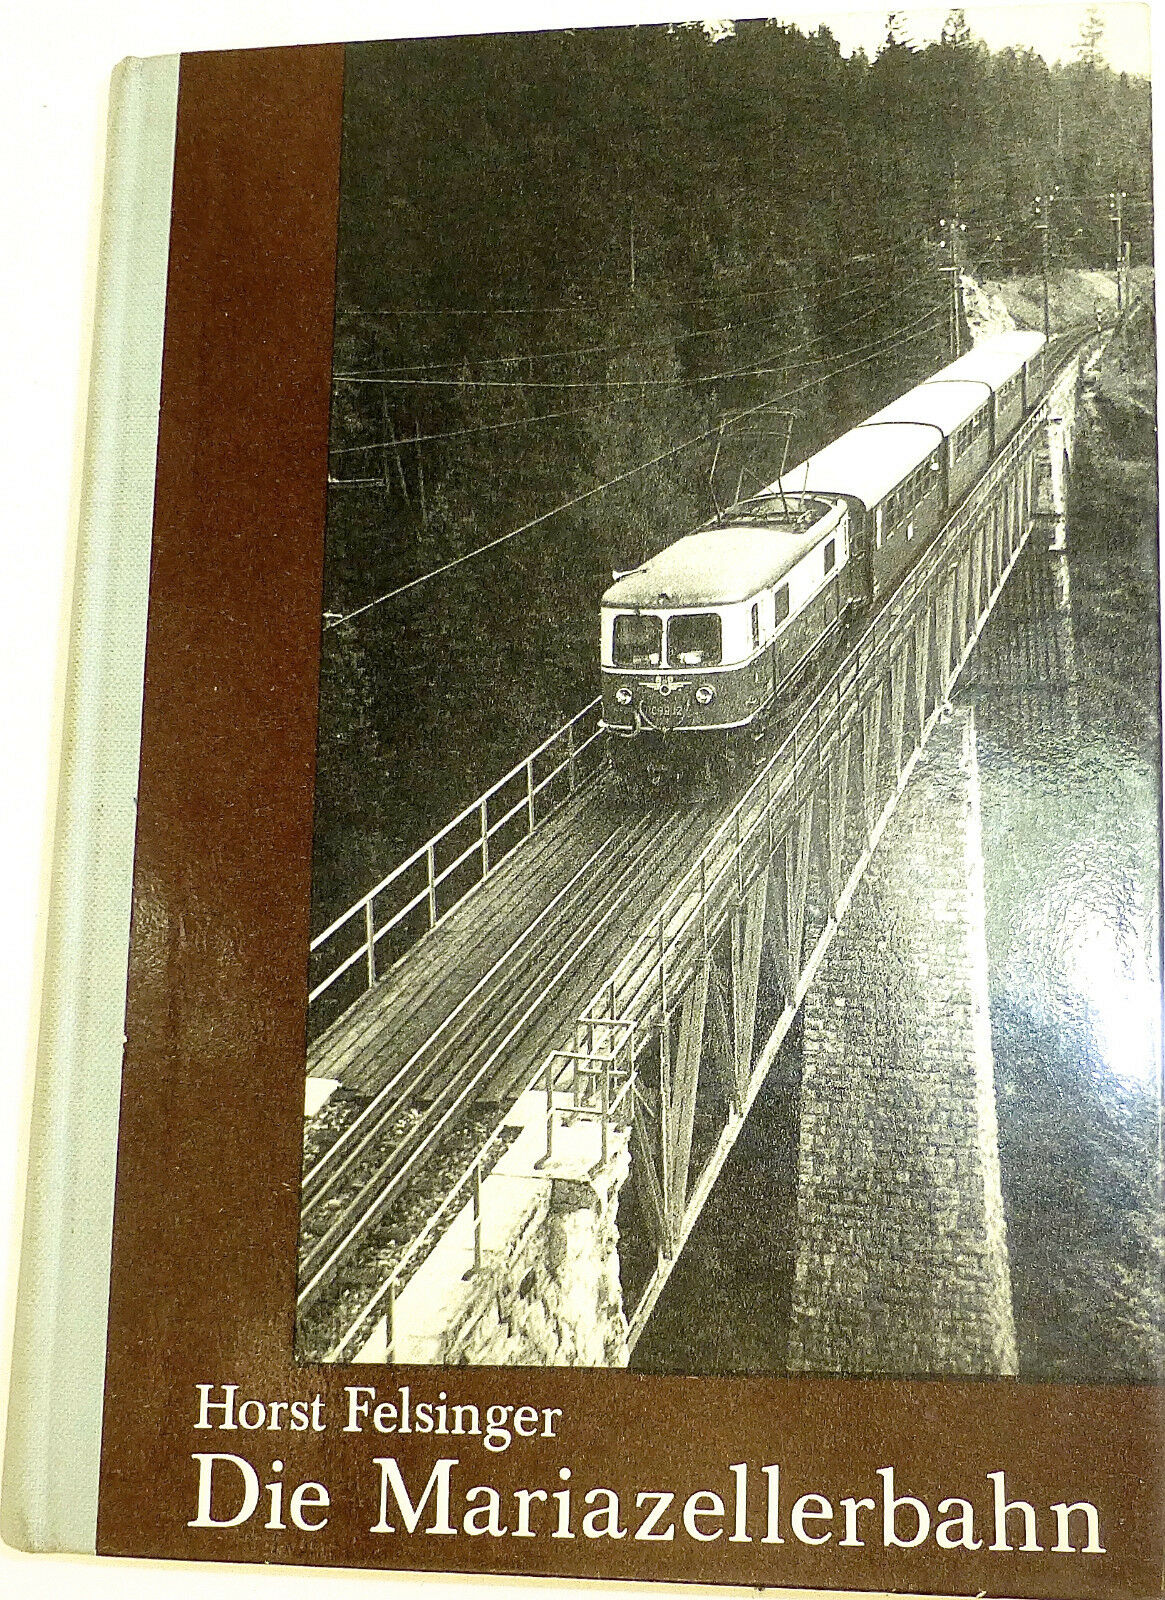 La Maria Zeller ferroviario Horst felsinger Verlag ferrovia Å √